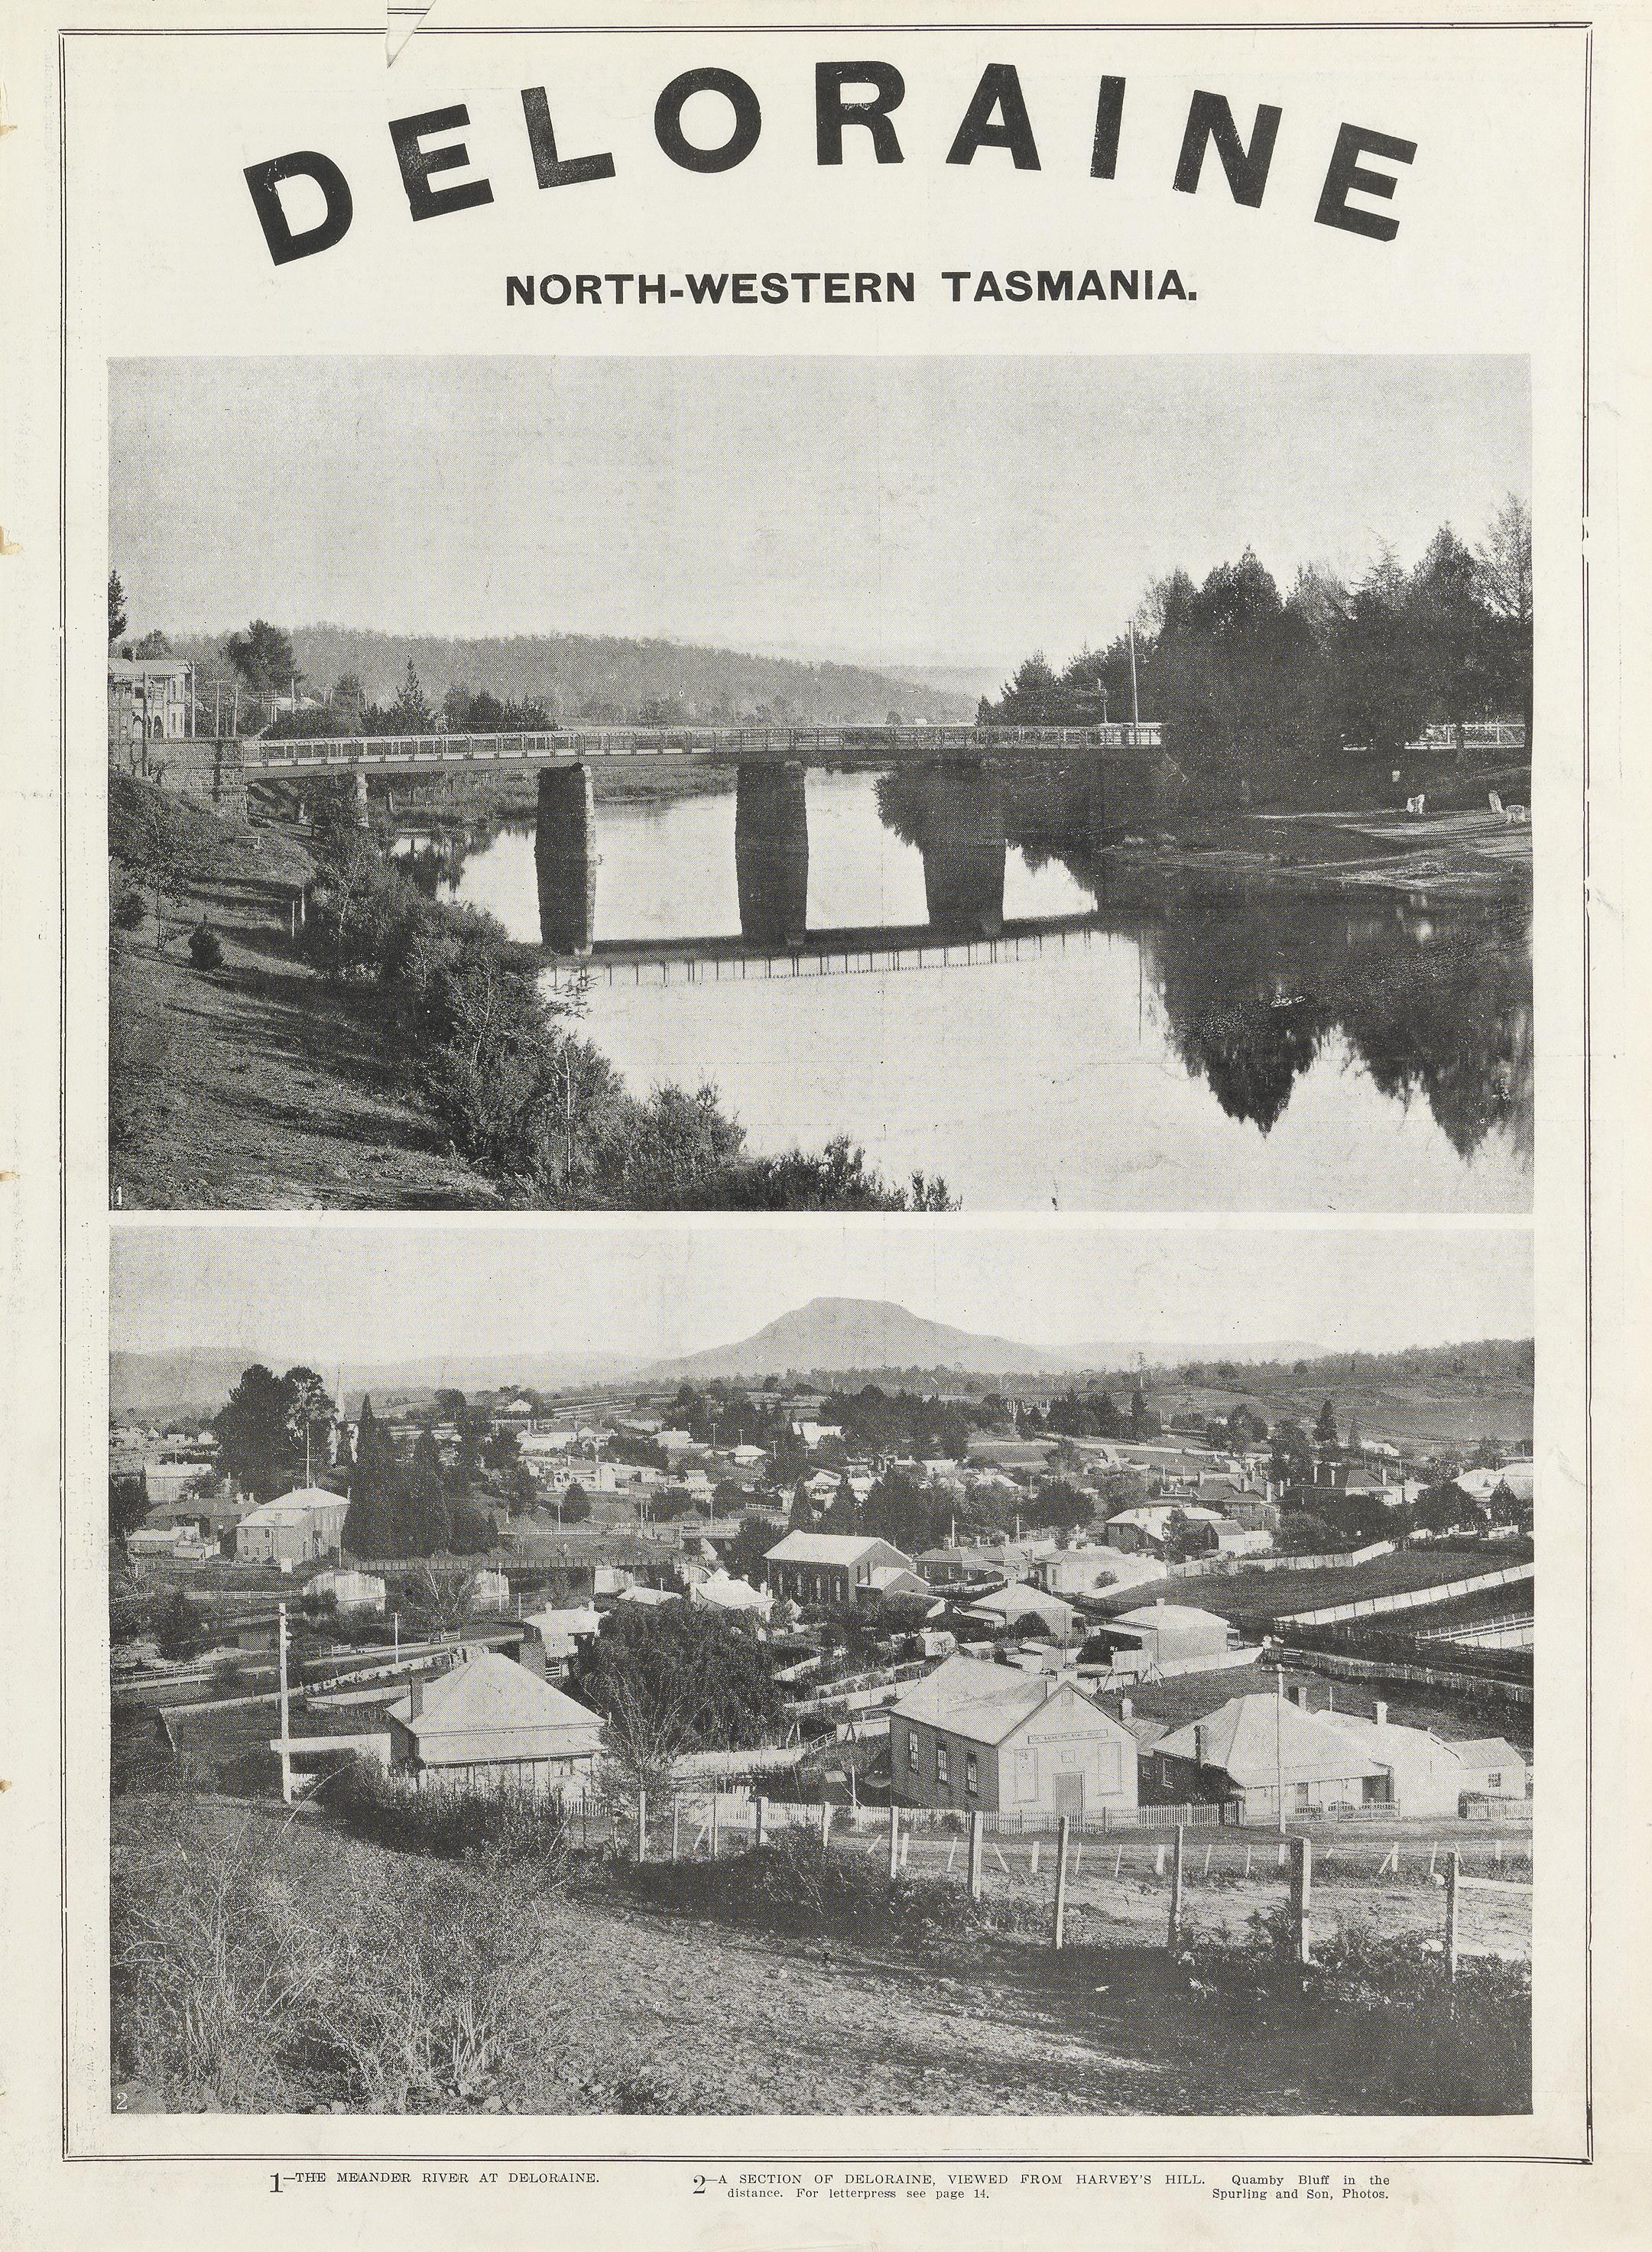 Deloraine, Tasmania (1919)